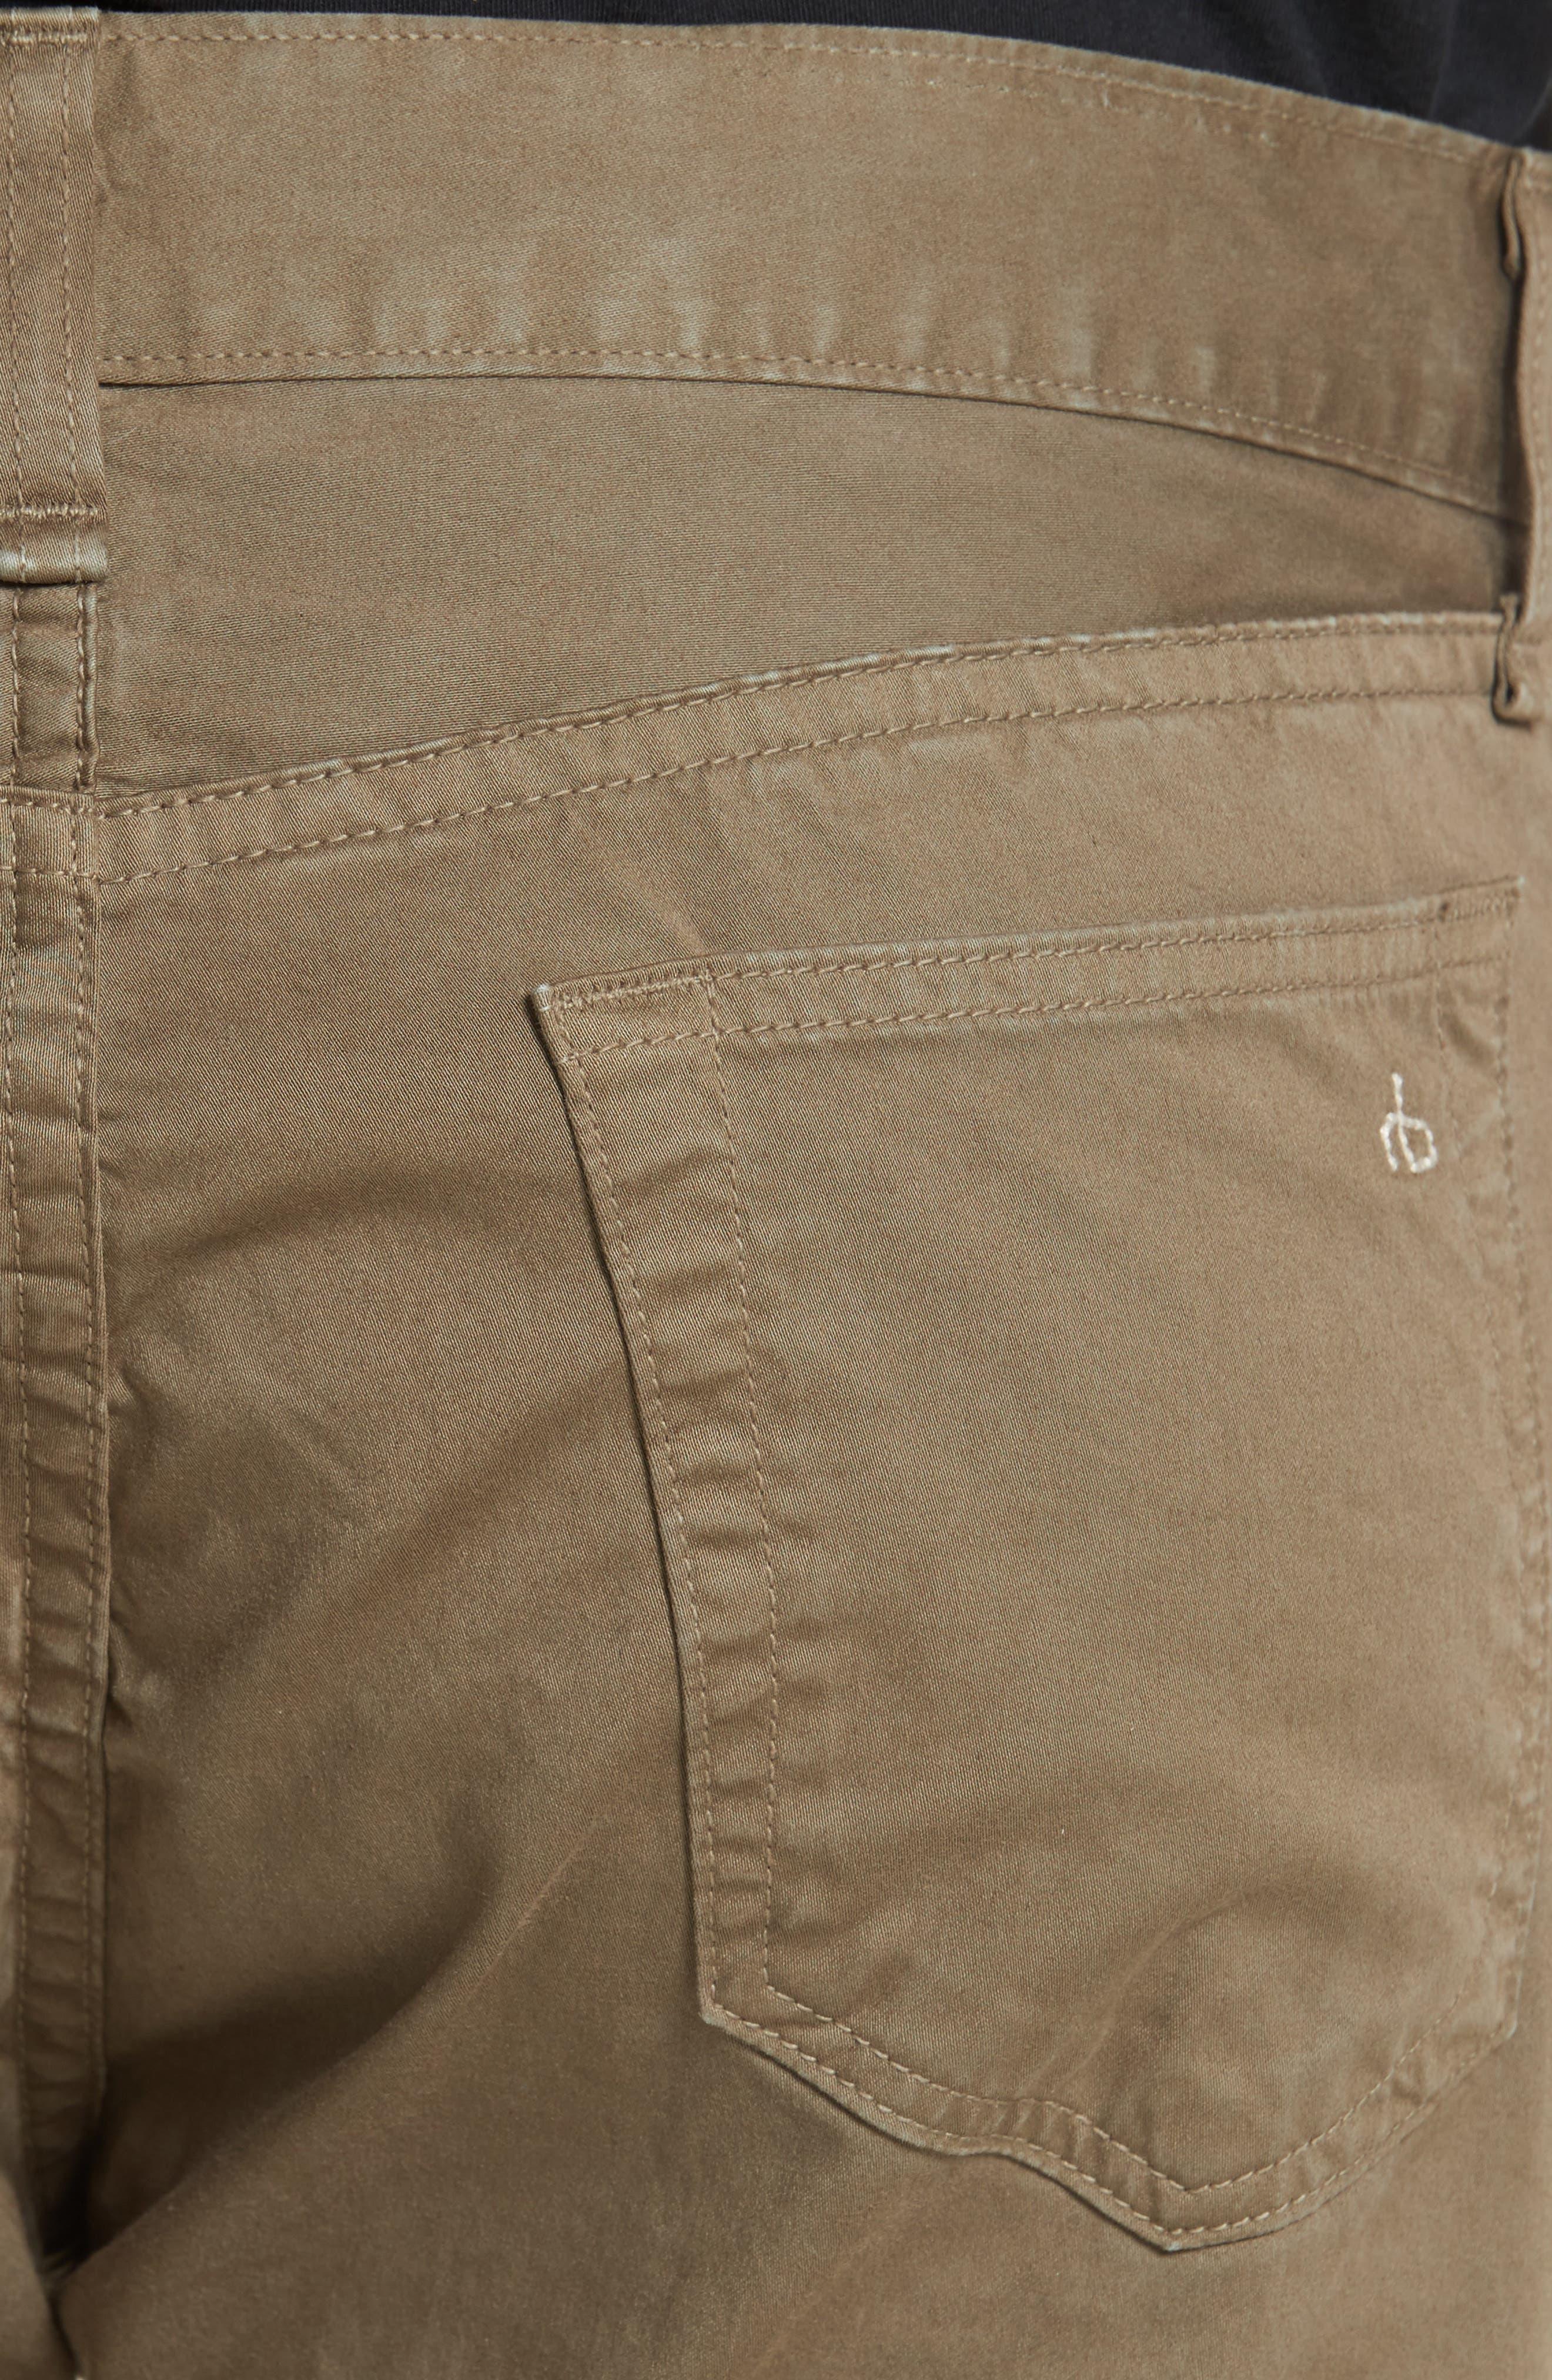 Fit 2 Five-Pocket Twill Pants,                             Alternate thumbnail 5, color,                             319